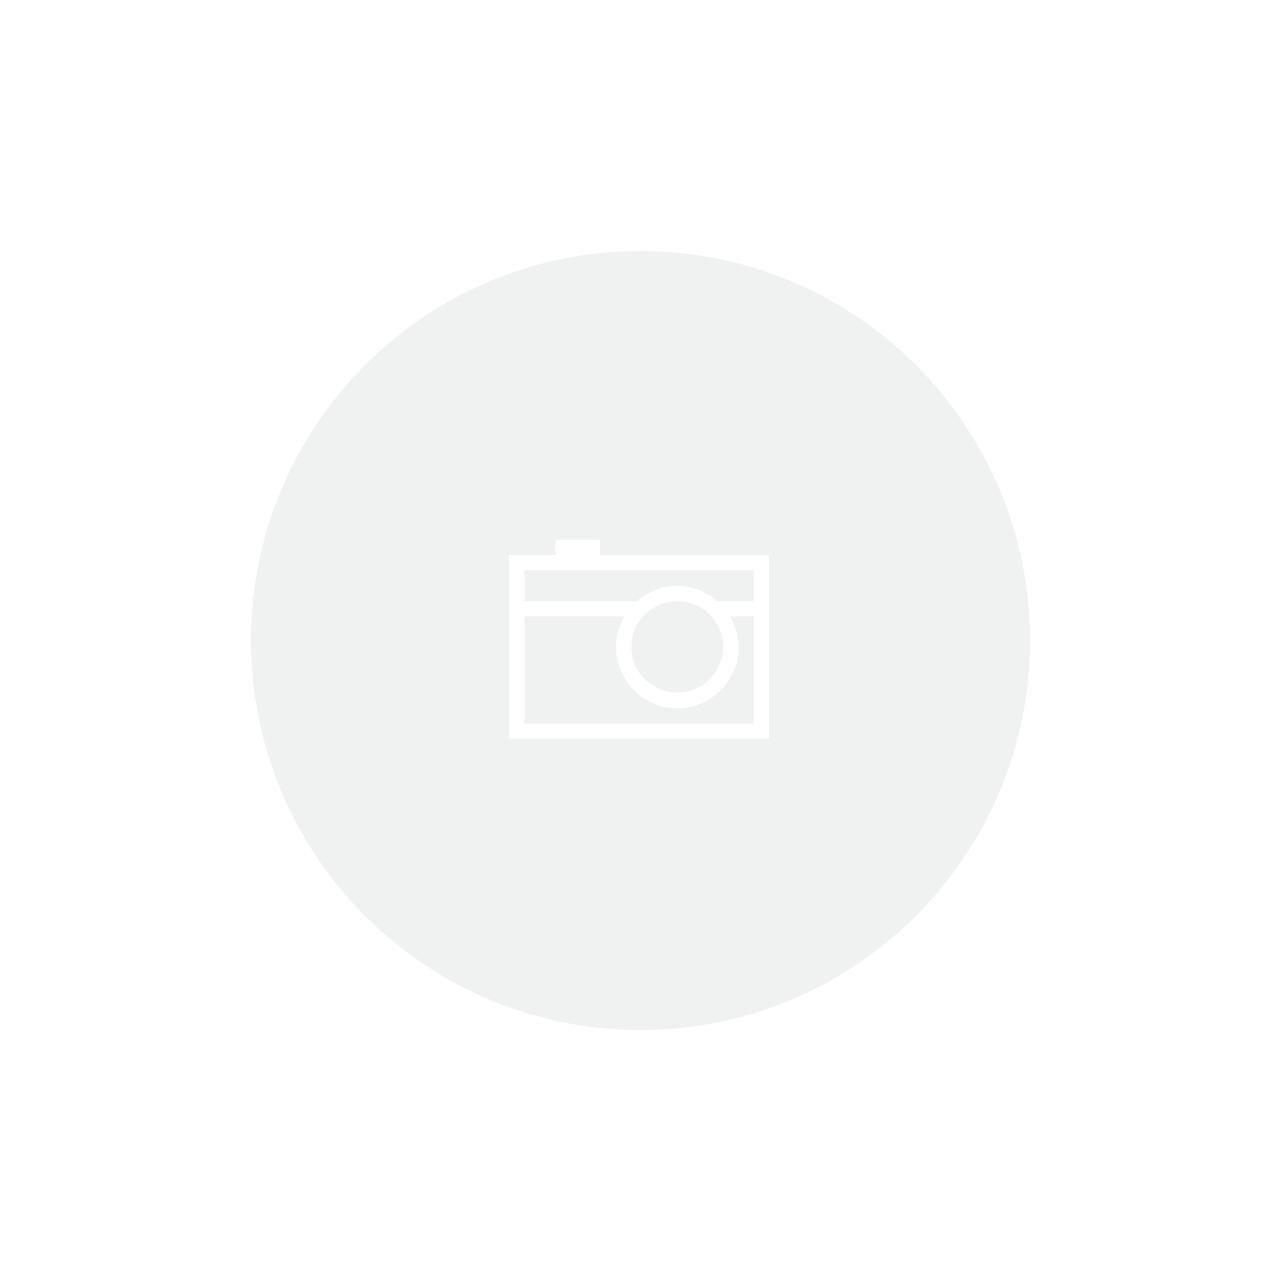 Placa de Video Powercolor RED DEVIL Radeon RX 5700 XT Limited Edition 8GB 256bit GDDR6 - AXRX-5700XT-8GBD6-3DHEP/OC